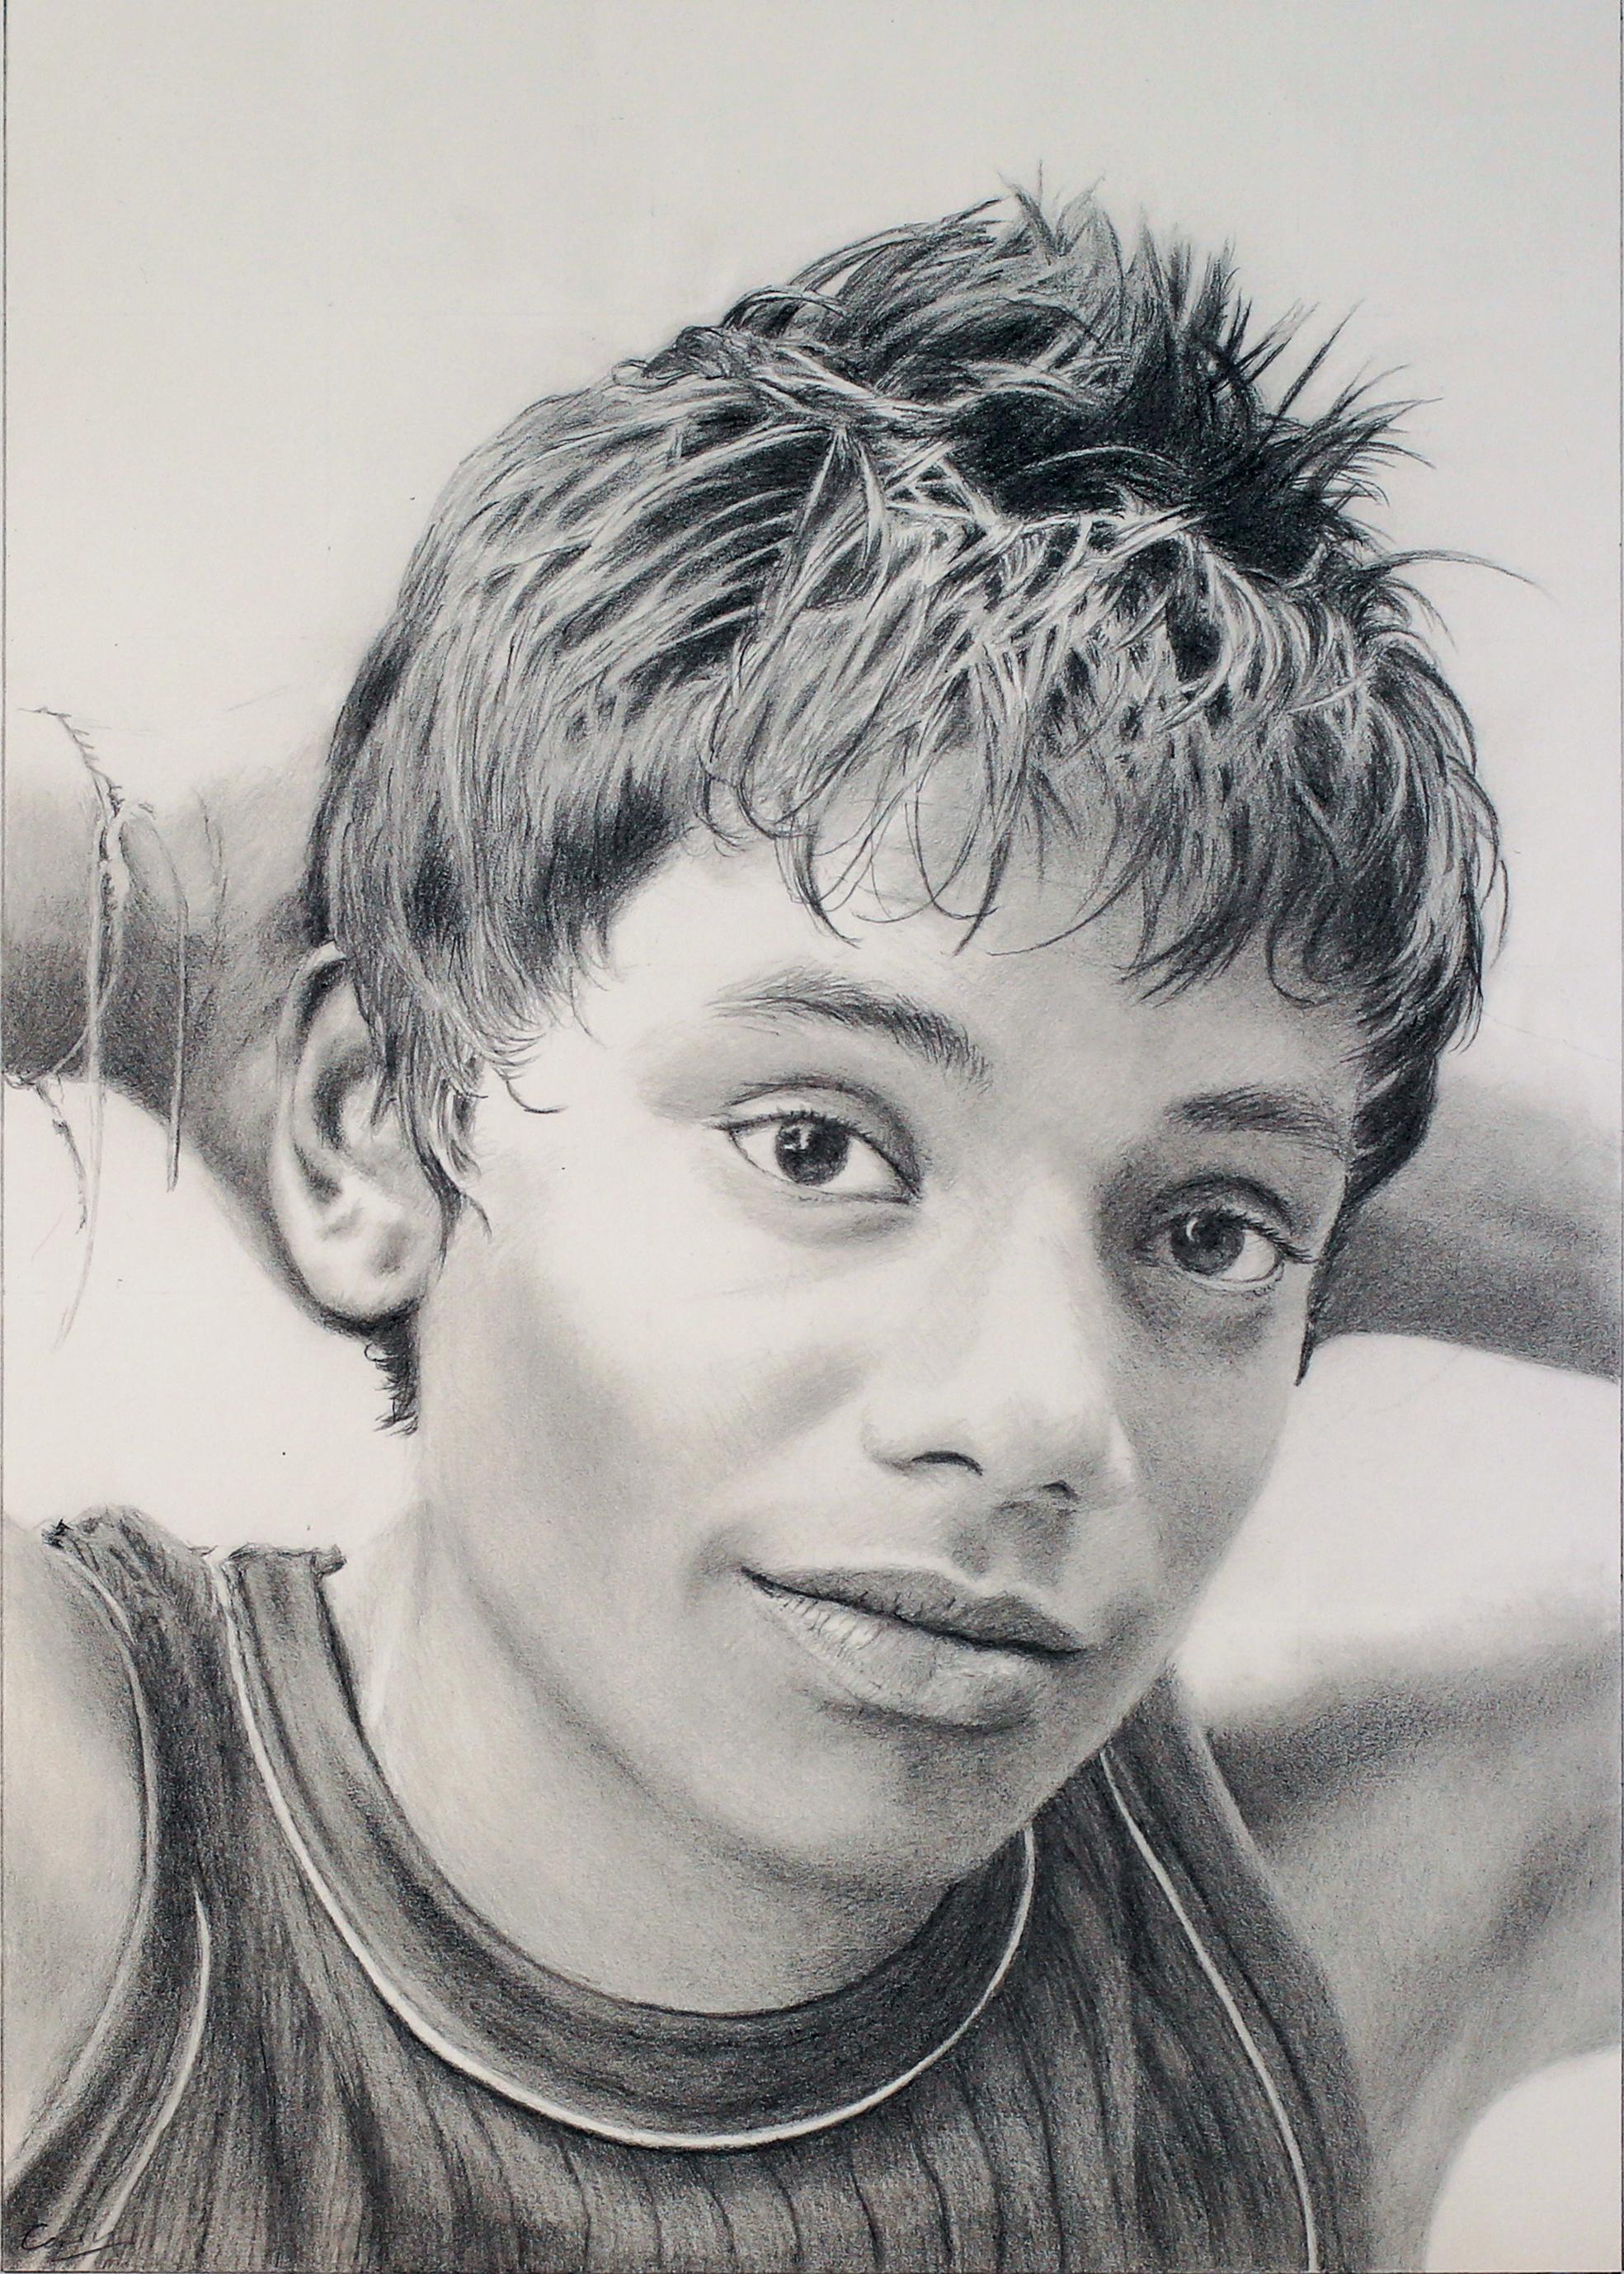 Pencil drawing portrait of a sri lankan boy